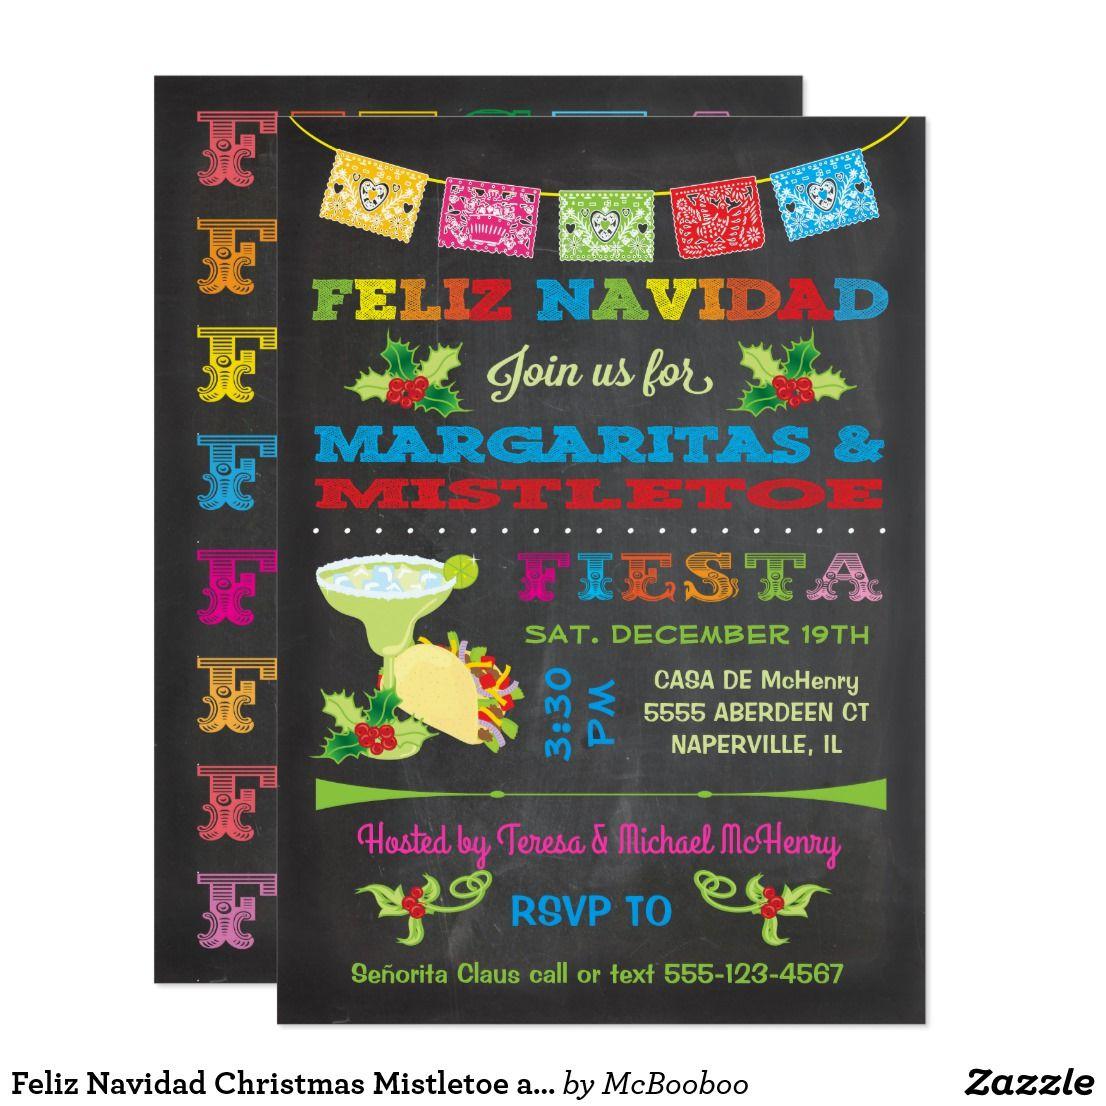 Feliz Navidad Christmas Mistletoe and Margaritas Invitation | Zazzle.com